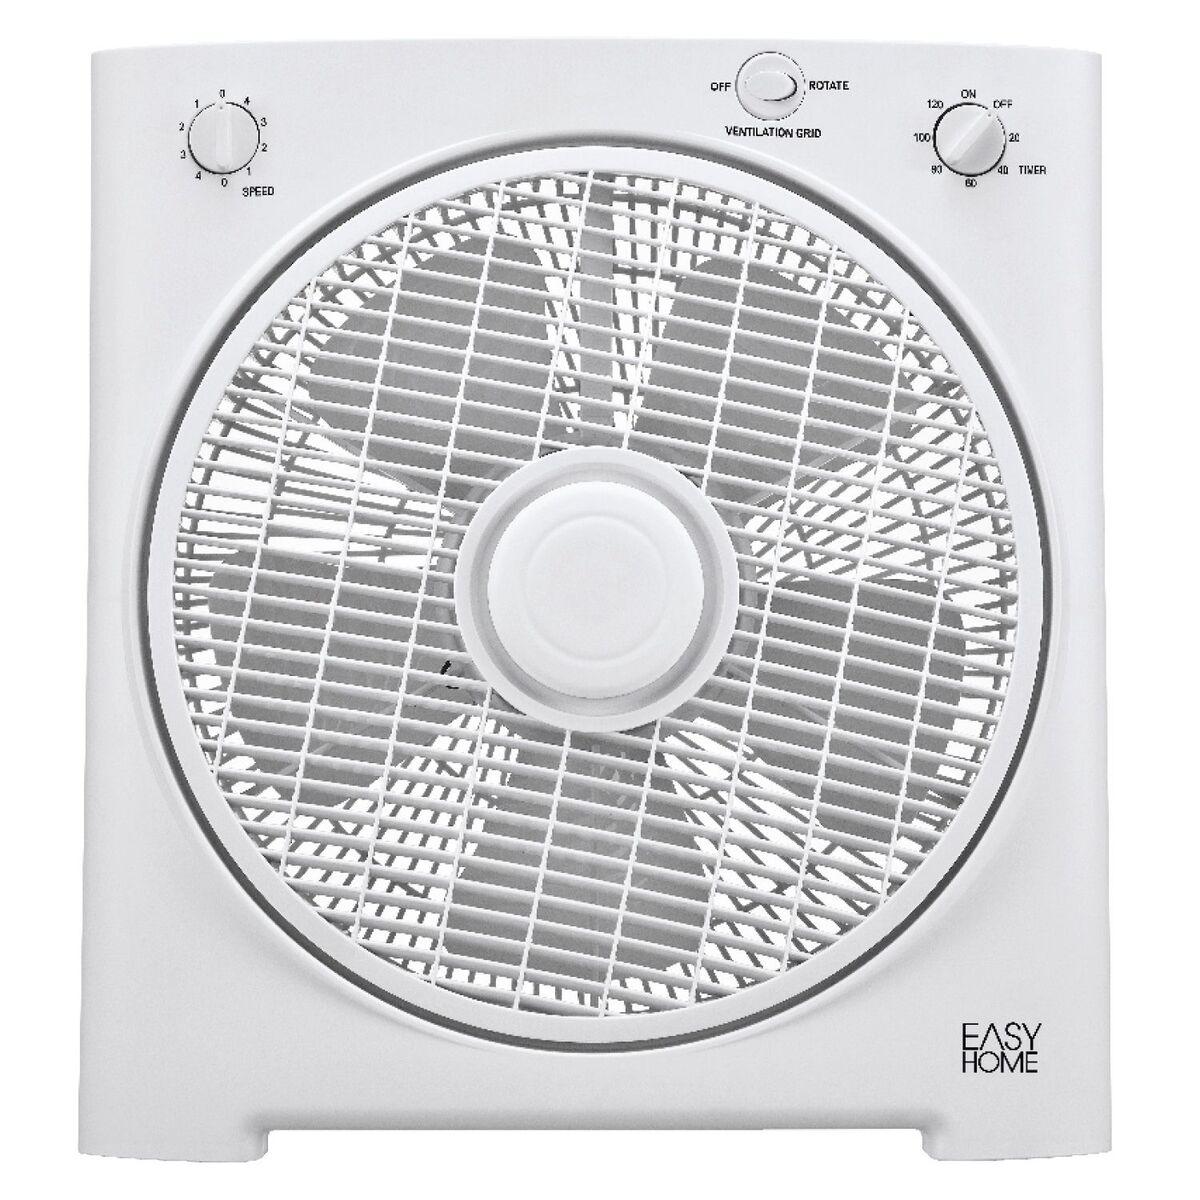 Bild 1 von EASY HOME®  Box-Ventilator